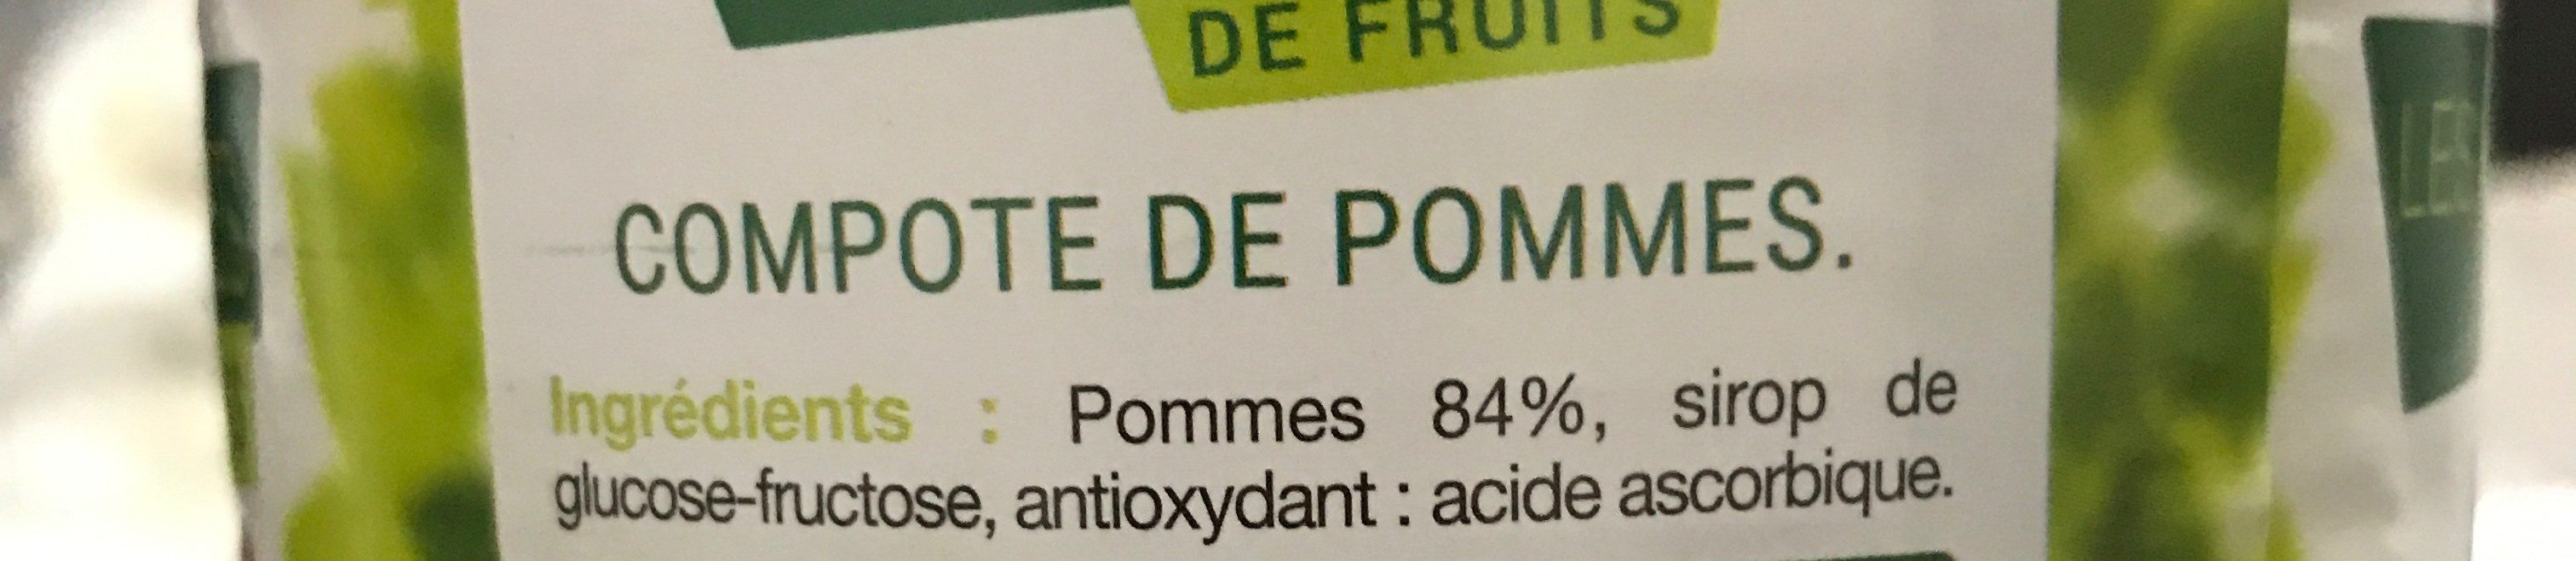 Compote De Pommes Valade 850 Gr, 3 Boîtes - Ingrédients